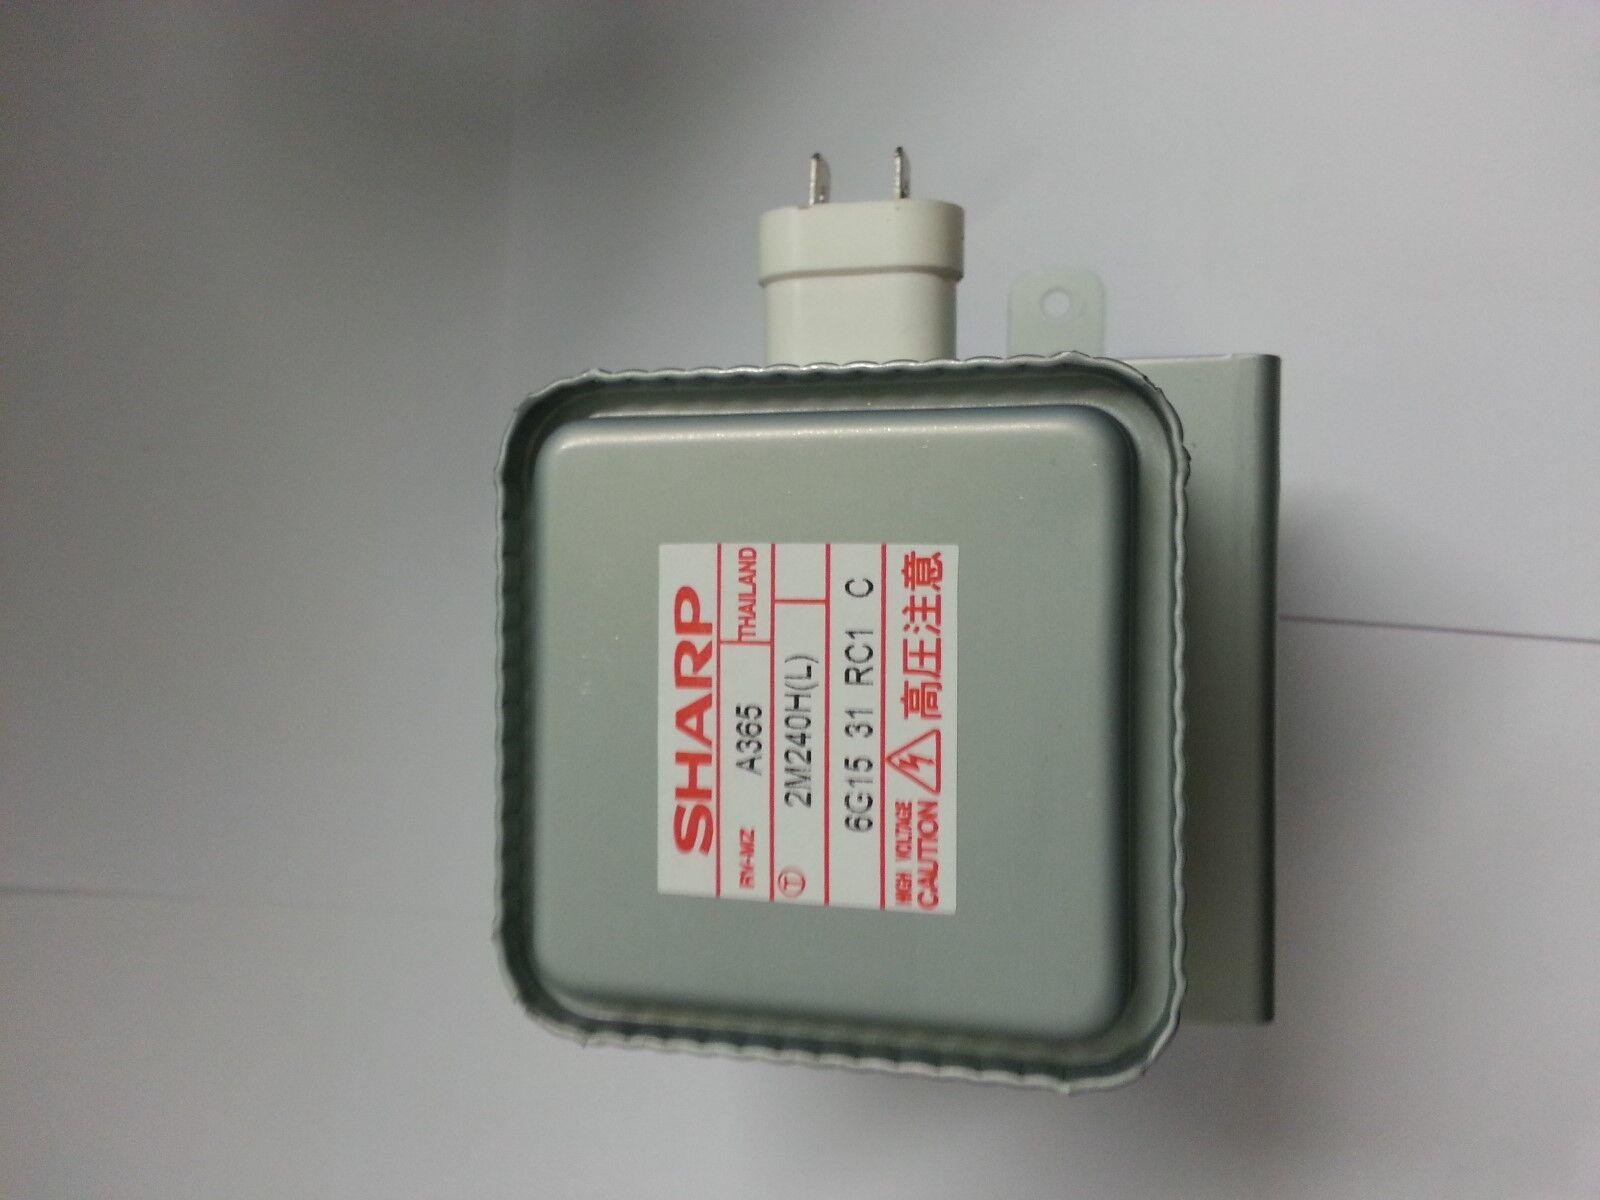 MAGNETRON 5550304009  555030400 9  ELECTROLUX BOITE 339